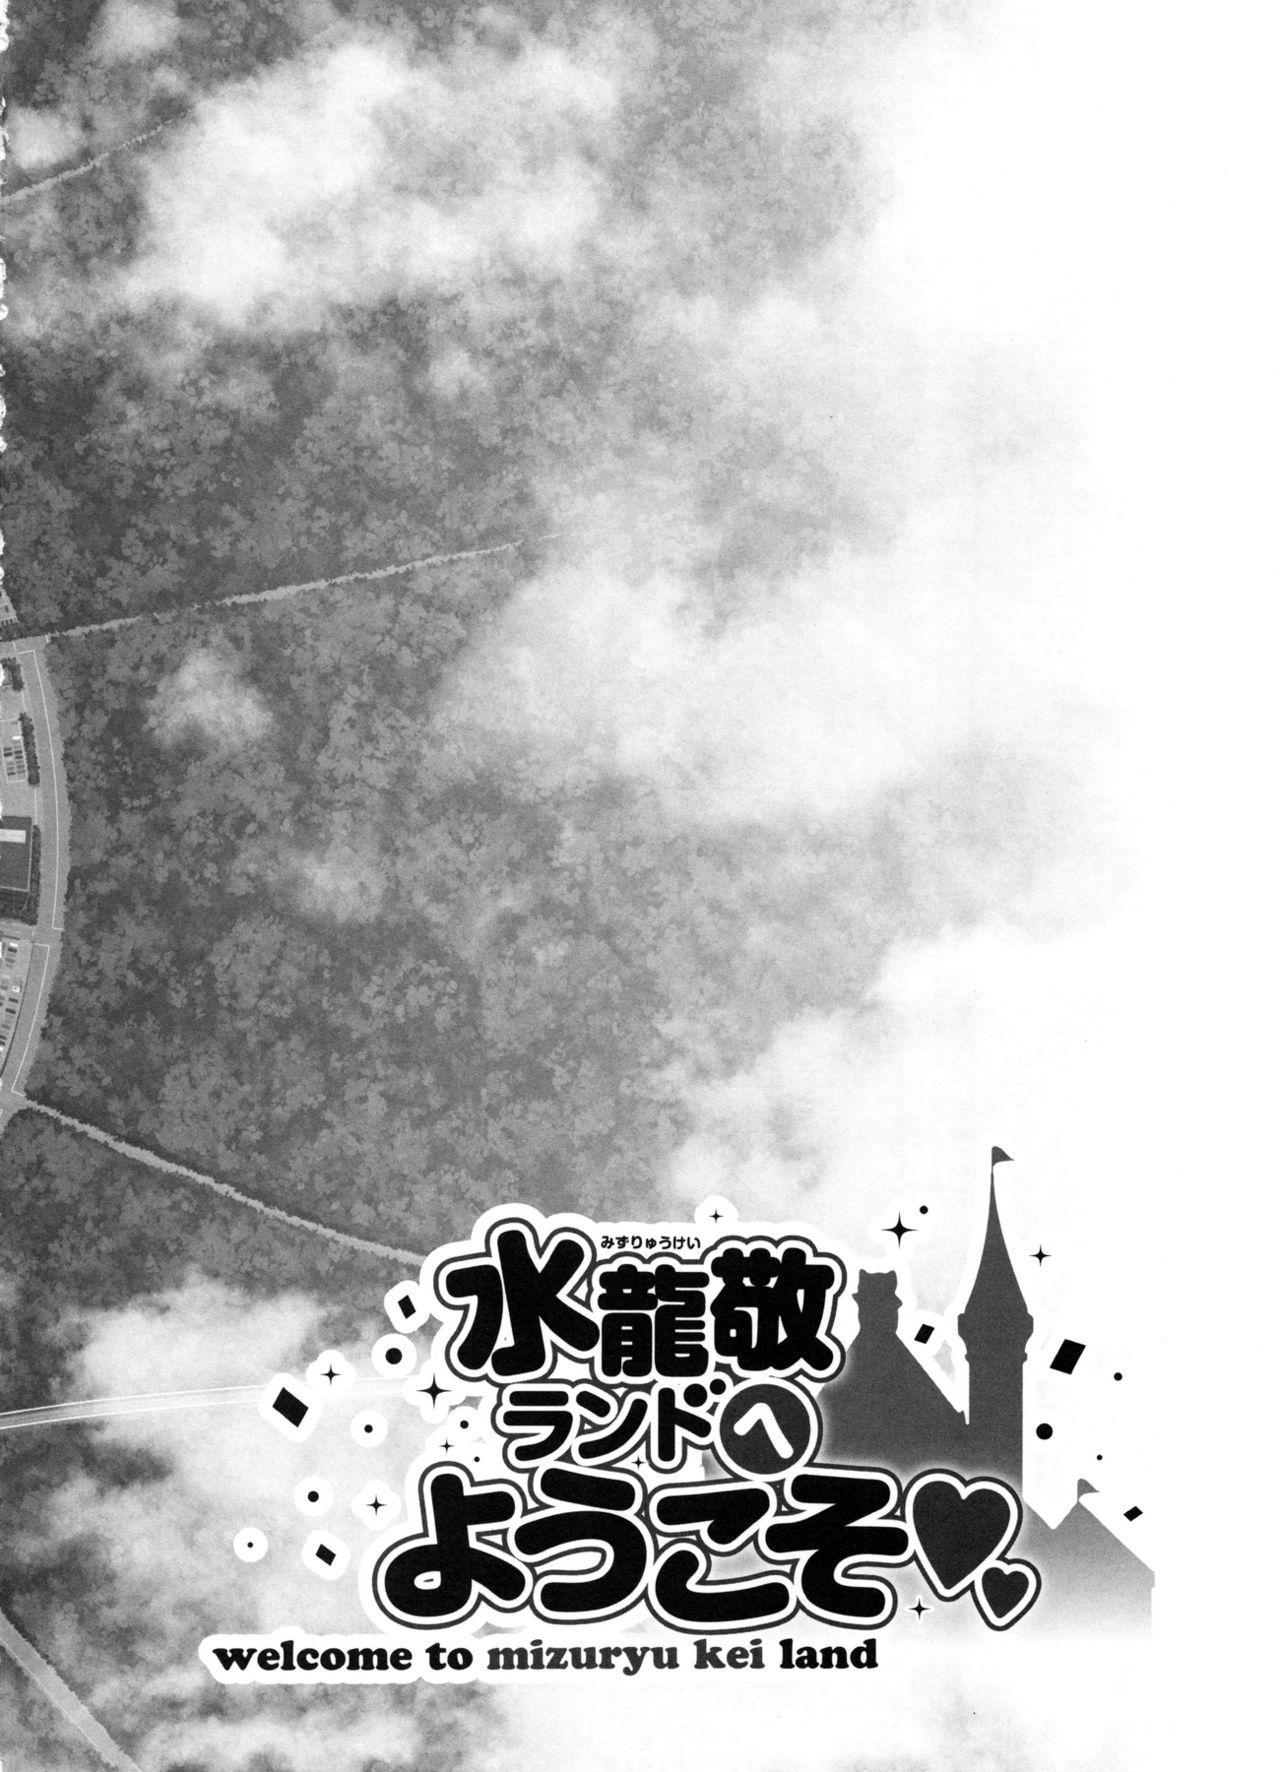 Oideyo! Mizuryu Kei Land the 5th Day 2